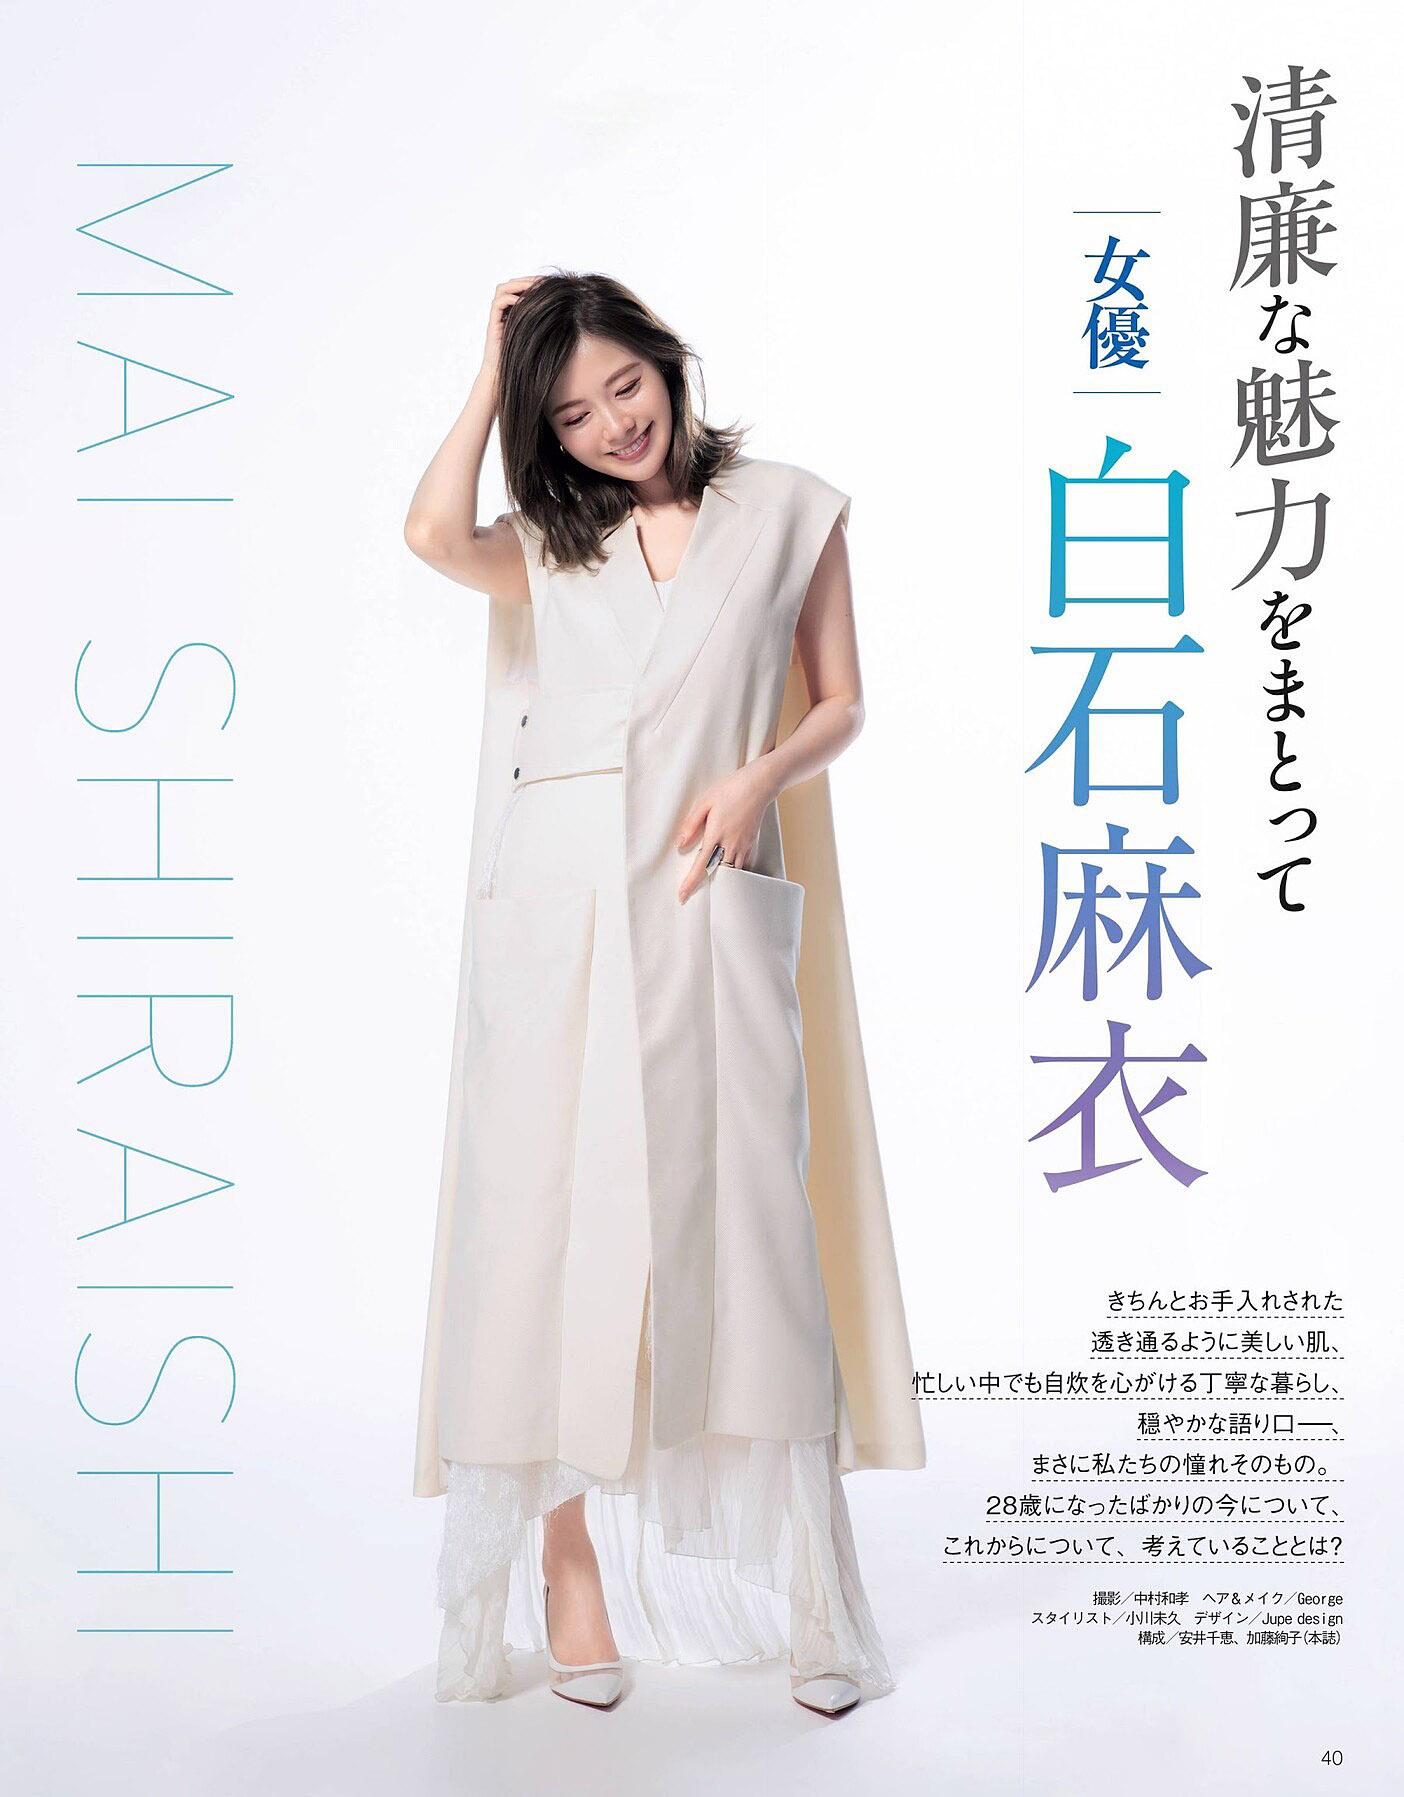 MShiraishi Biteki 2010 02.jpg